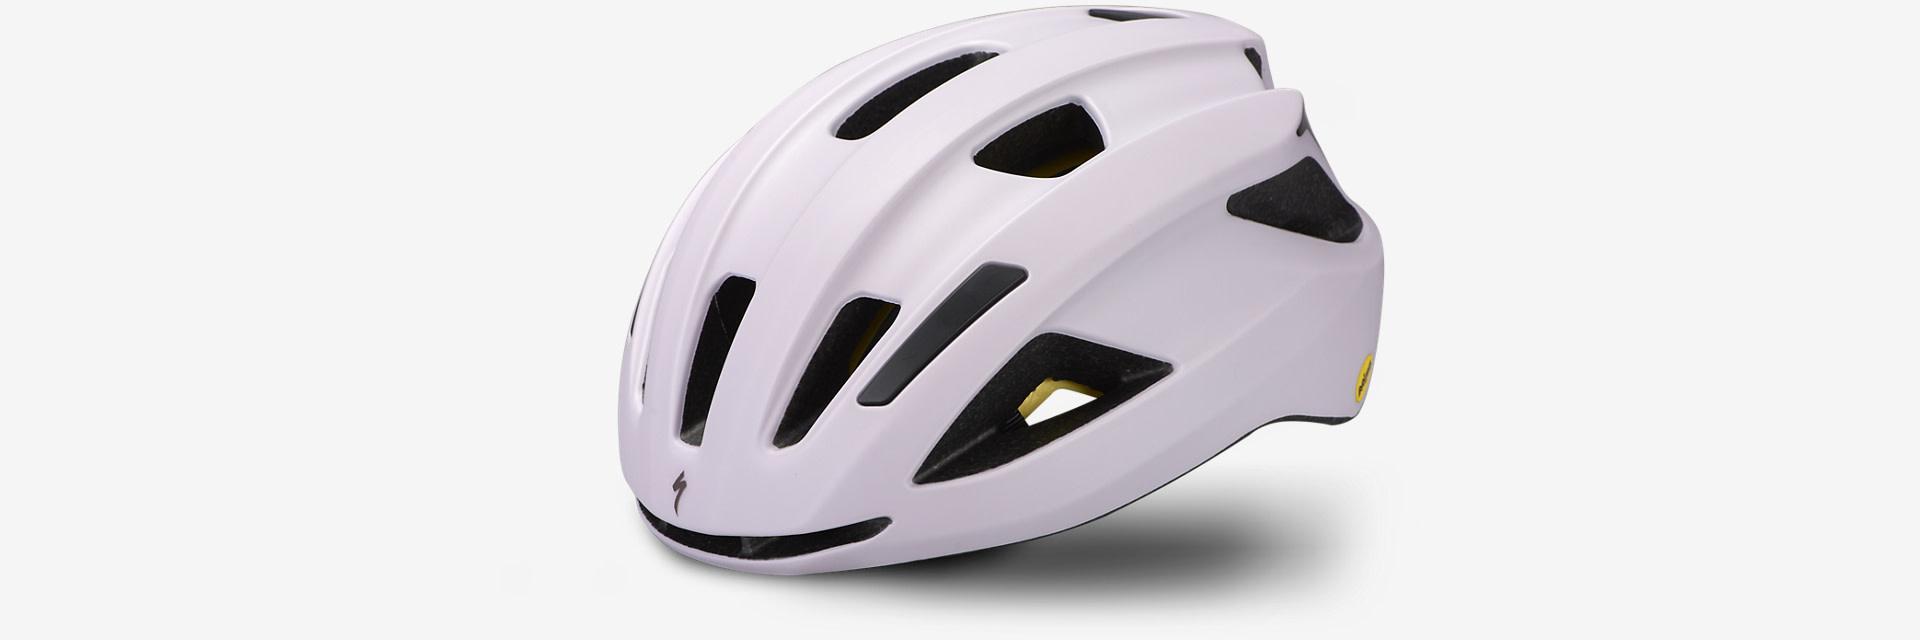 Specialized Helmet Align II MIPS M/L Satin Clay